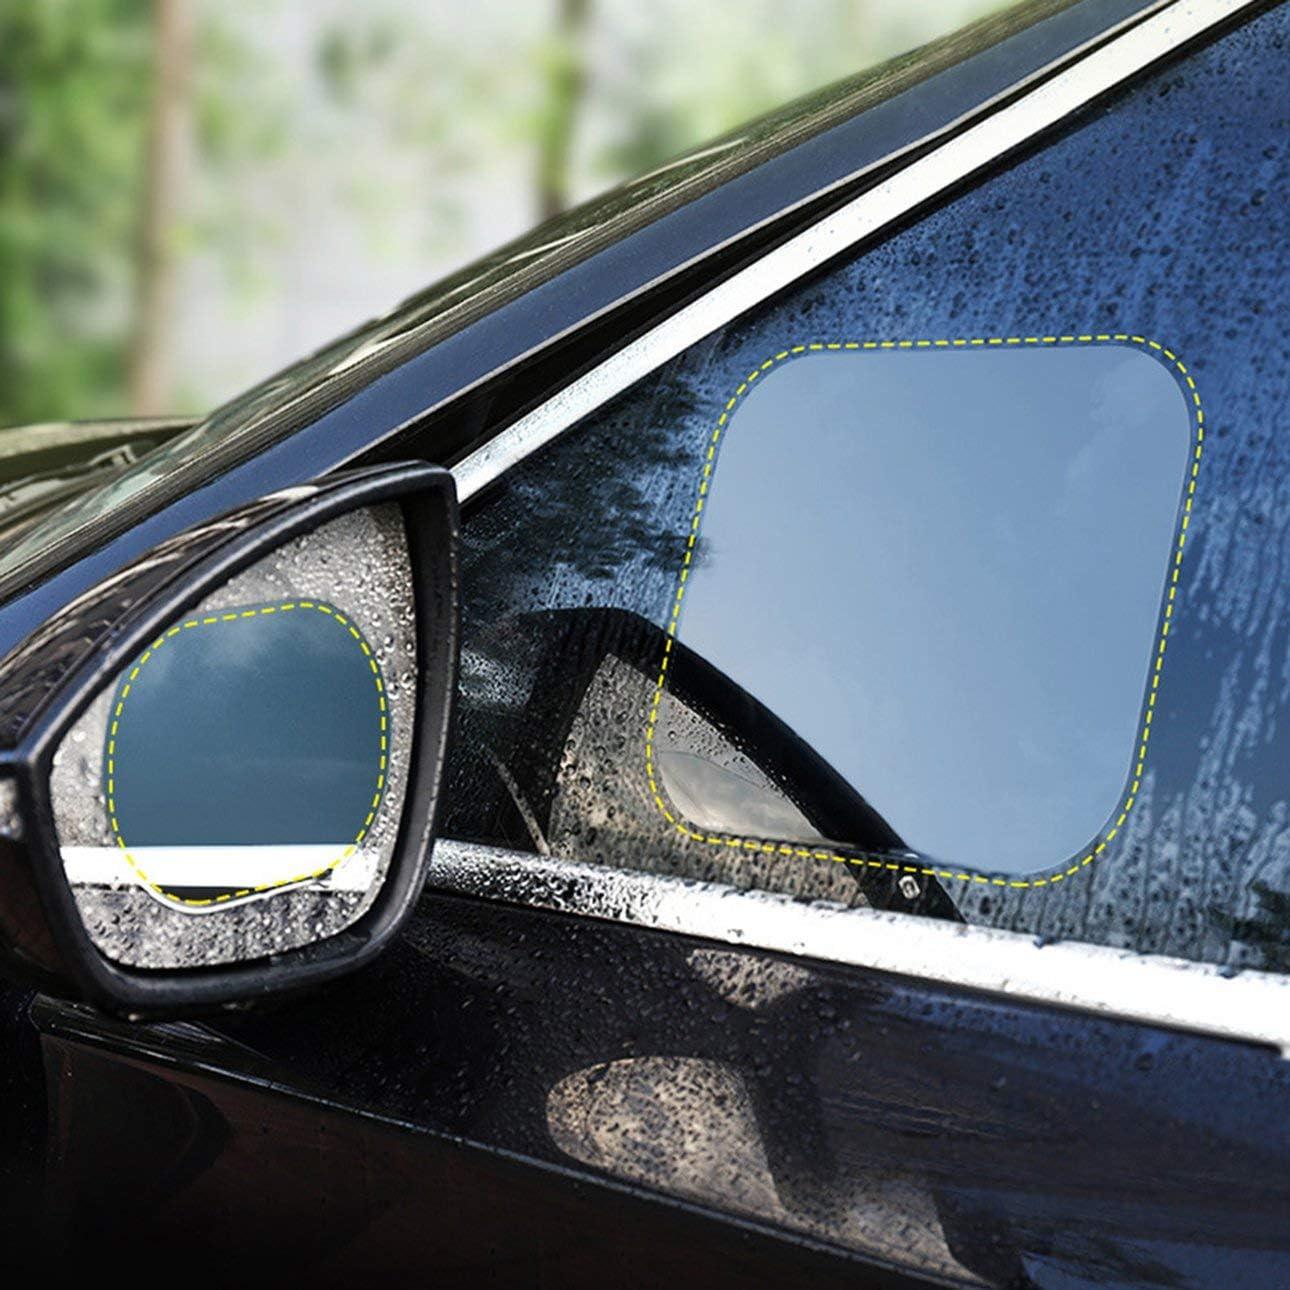 Ba30dellylelly Auto Rückspiegel Regenschutzfolie Auto Rückspiegel Regenschutzfolie Regenwasserantrieb Hydrophobe Folie Wasserdichtes Filmpaar Auto